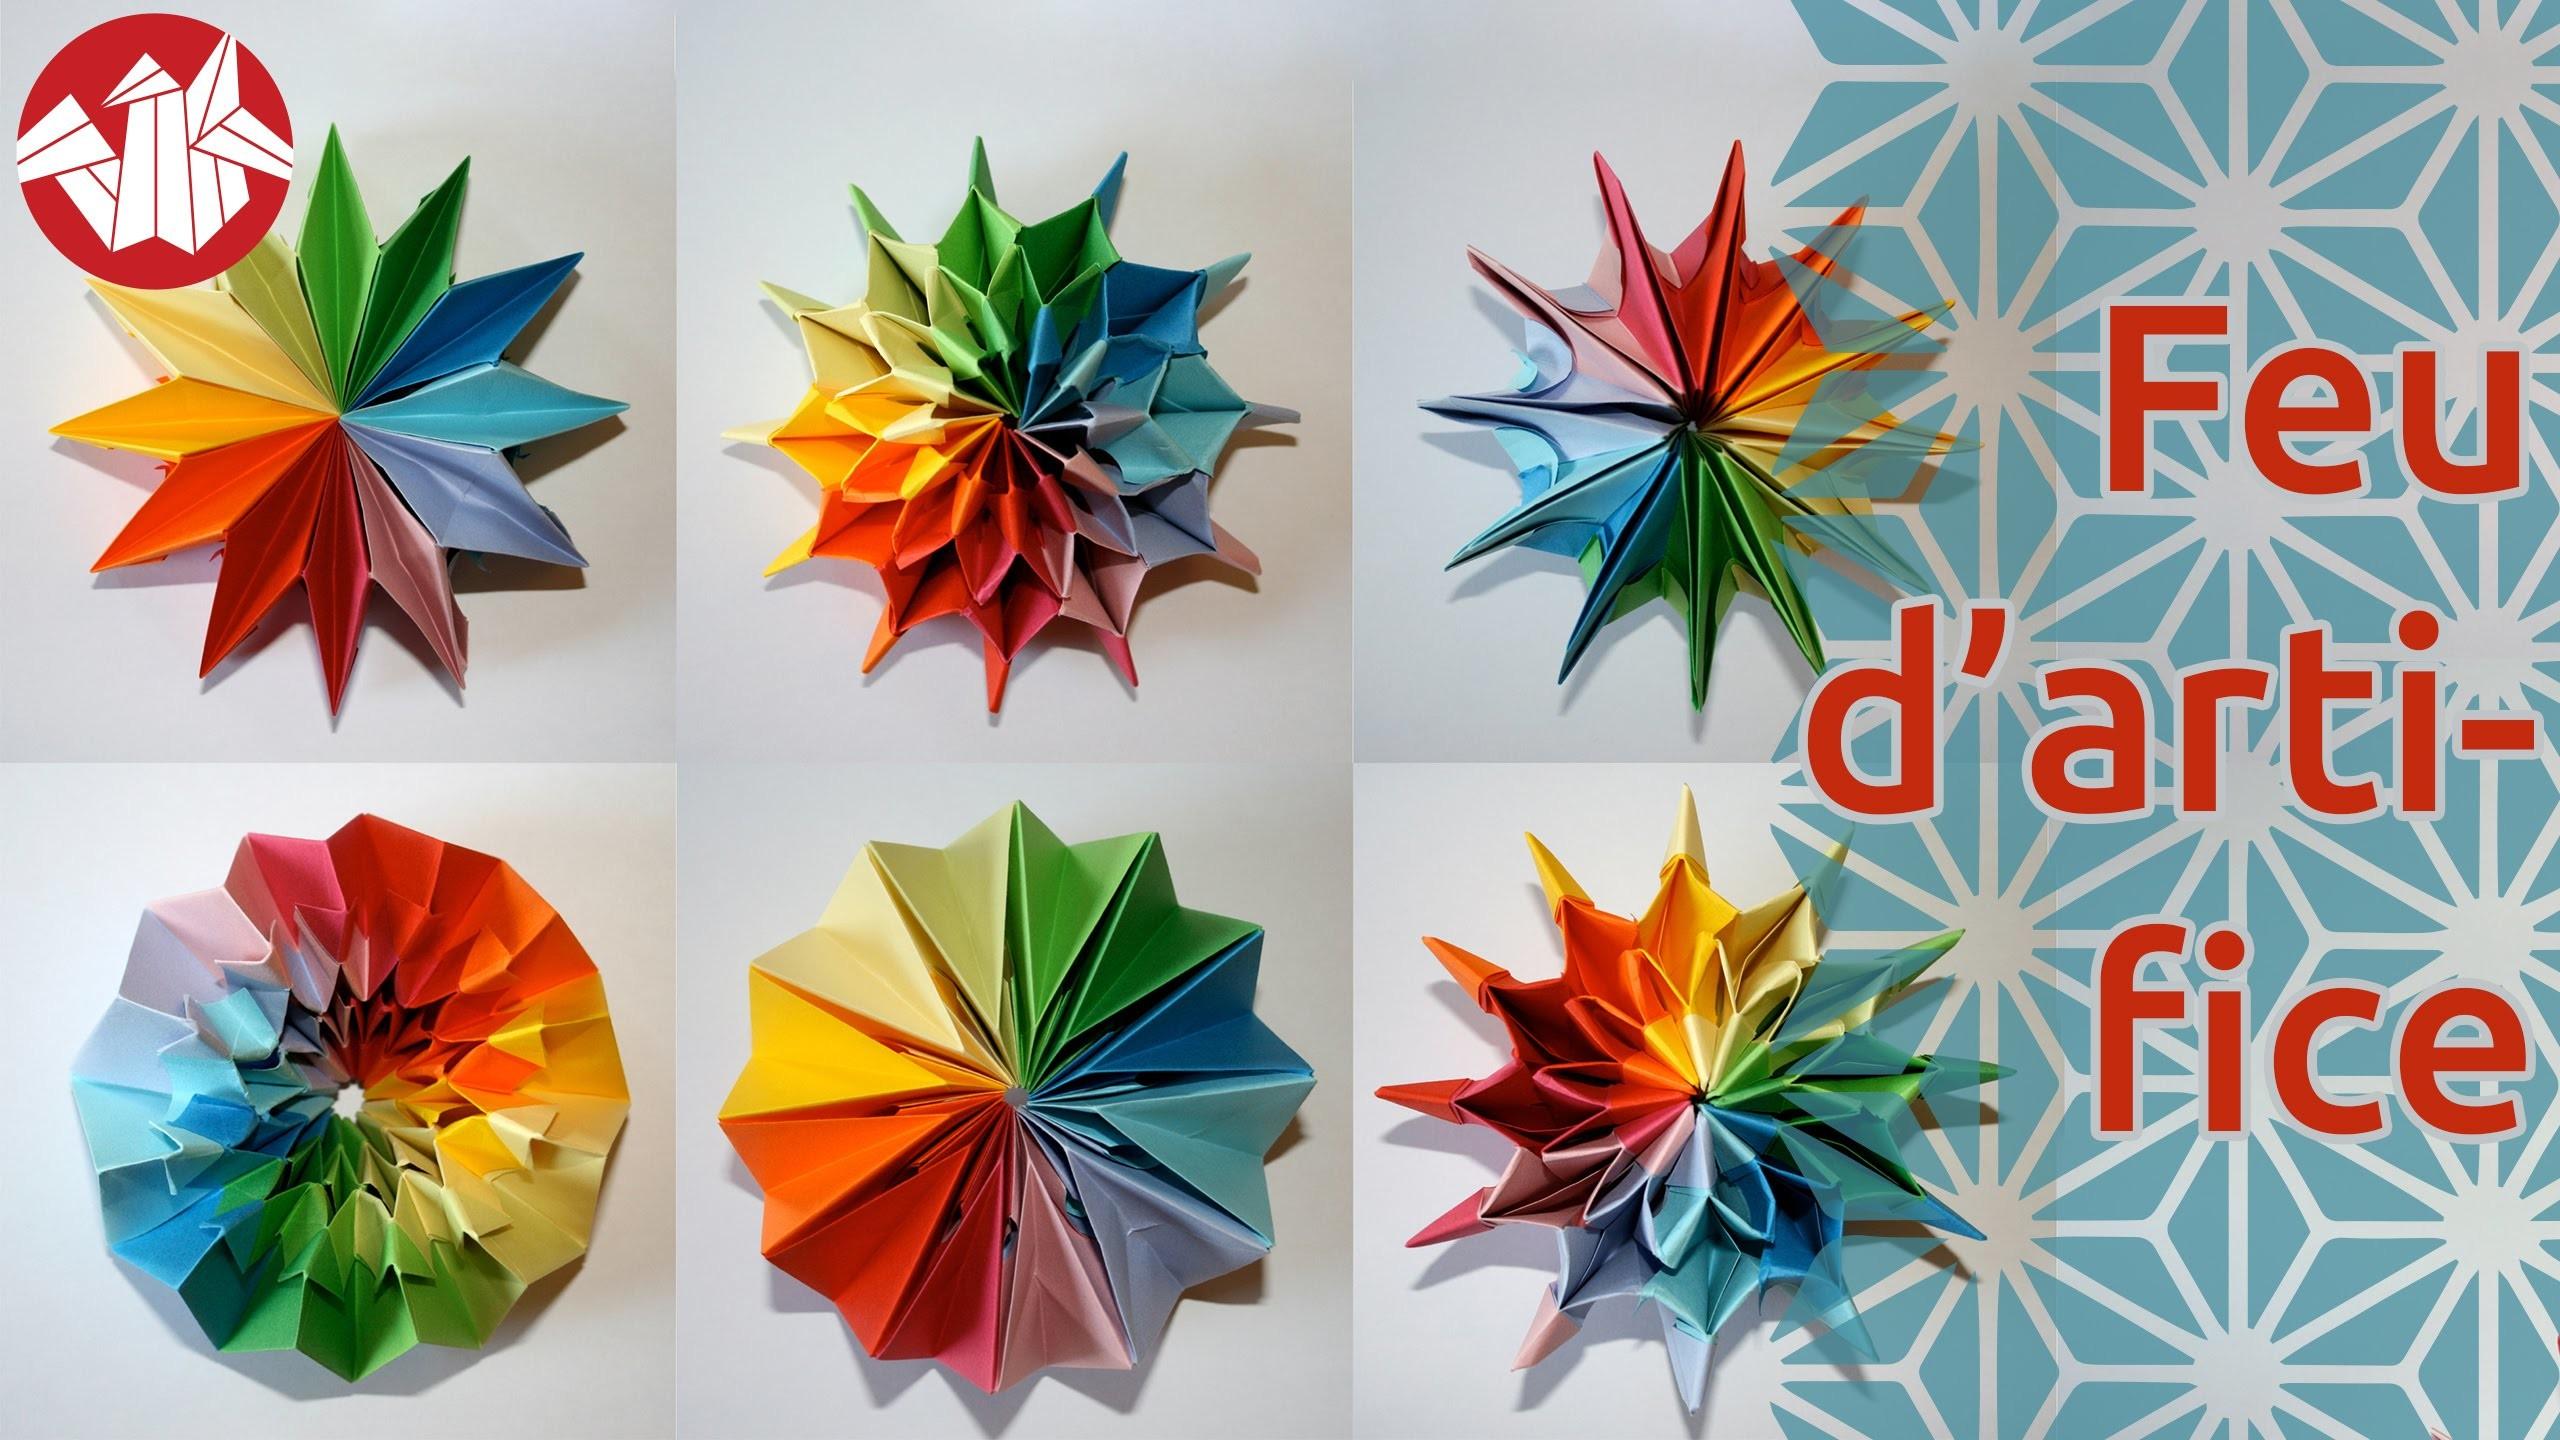 Origami - Feu d'artifice: Pliage modulaire qui se transforme [Senbazuru]